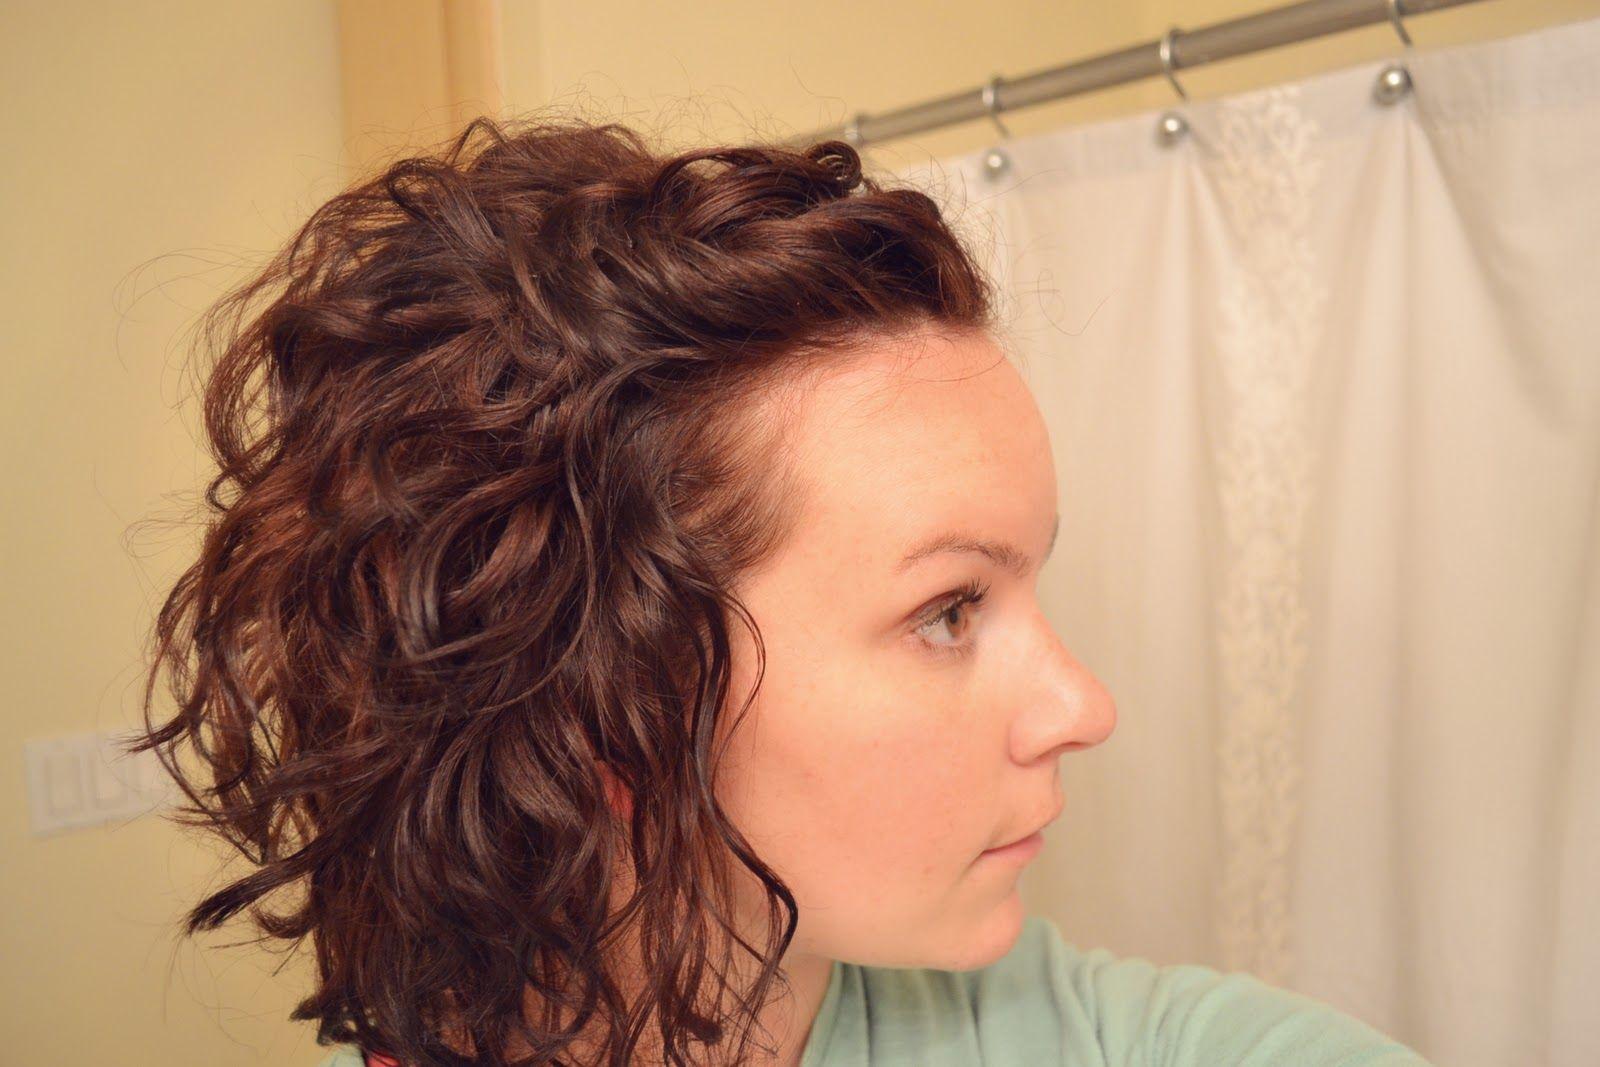 Mama Mandolin Curly Hair Part 2 Curly Hair Styles Naturally Curly Hair Styles Hair Styles